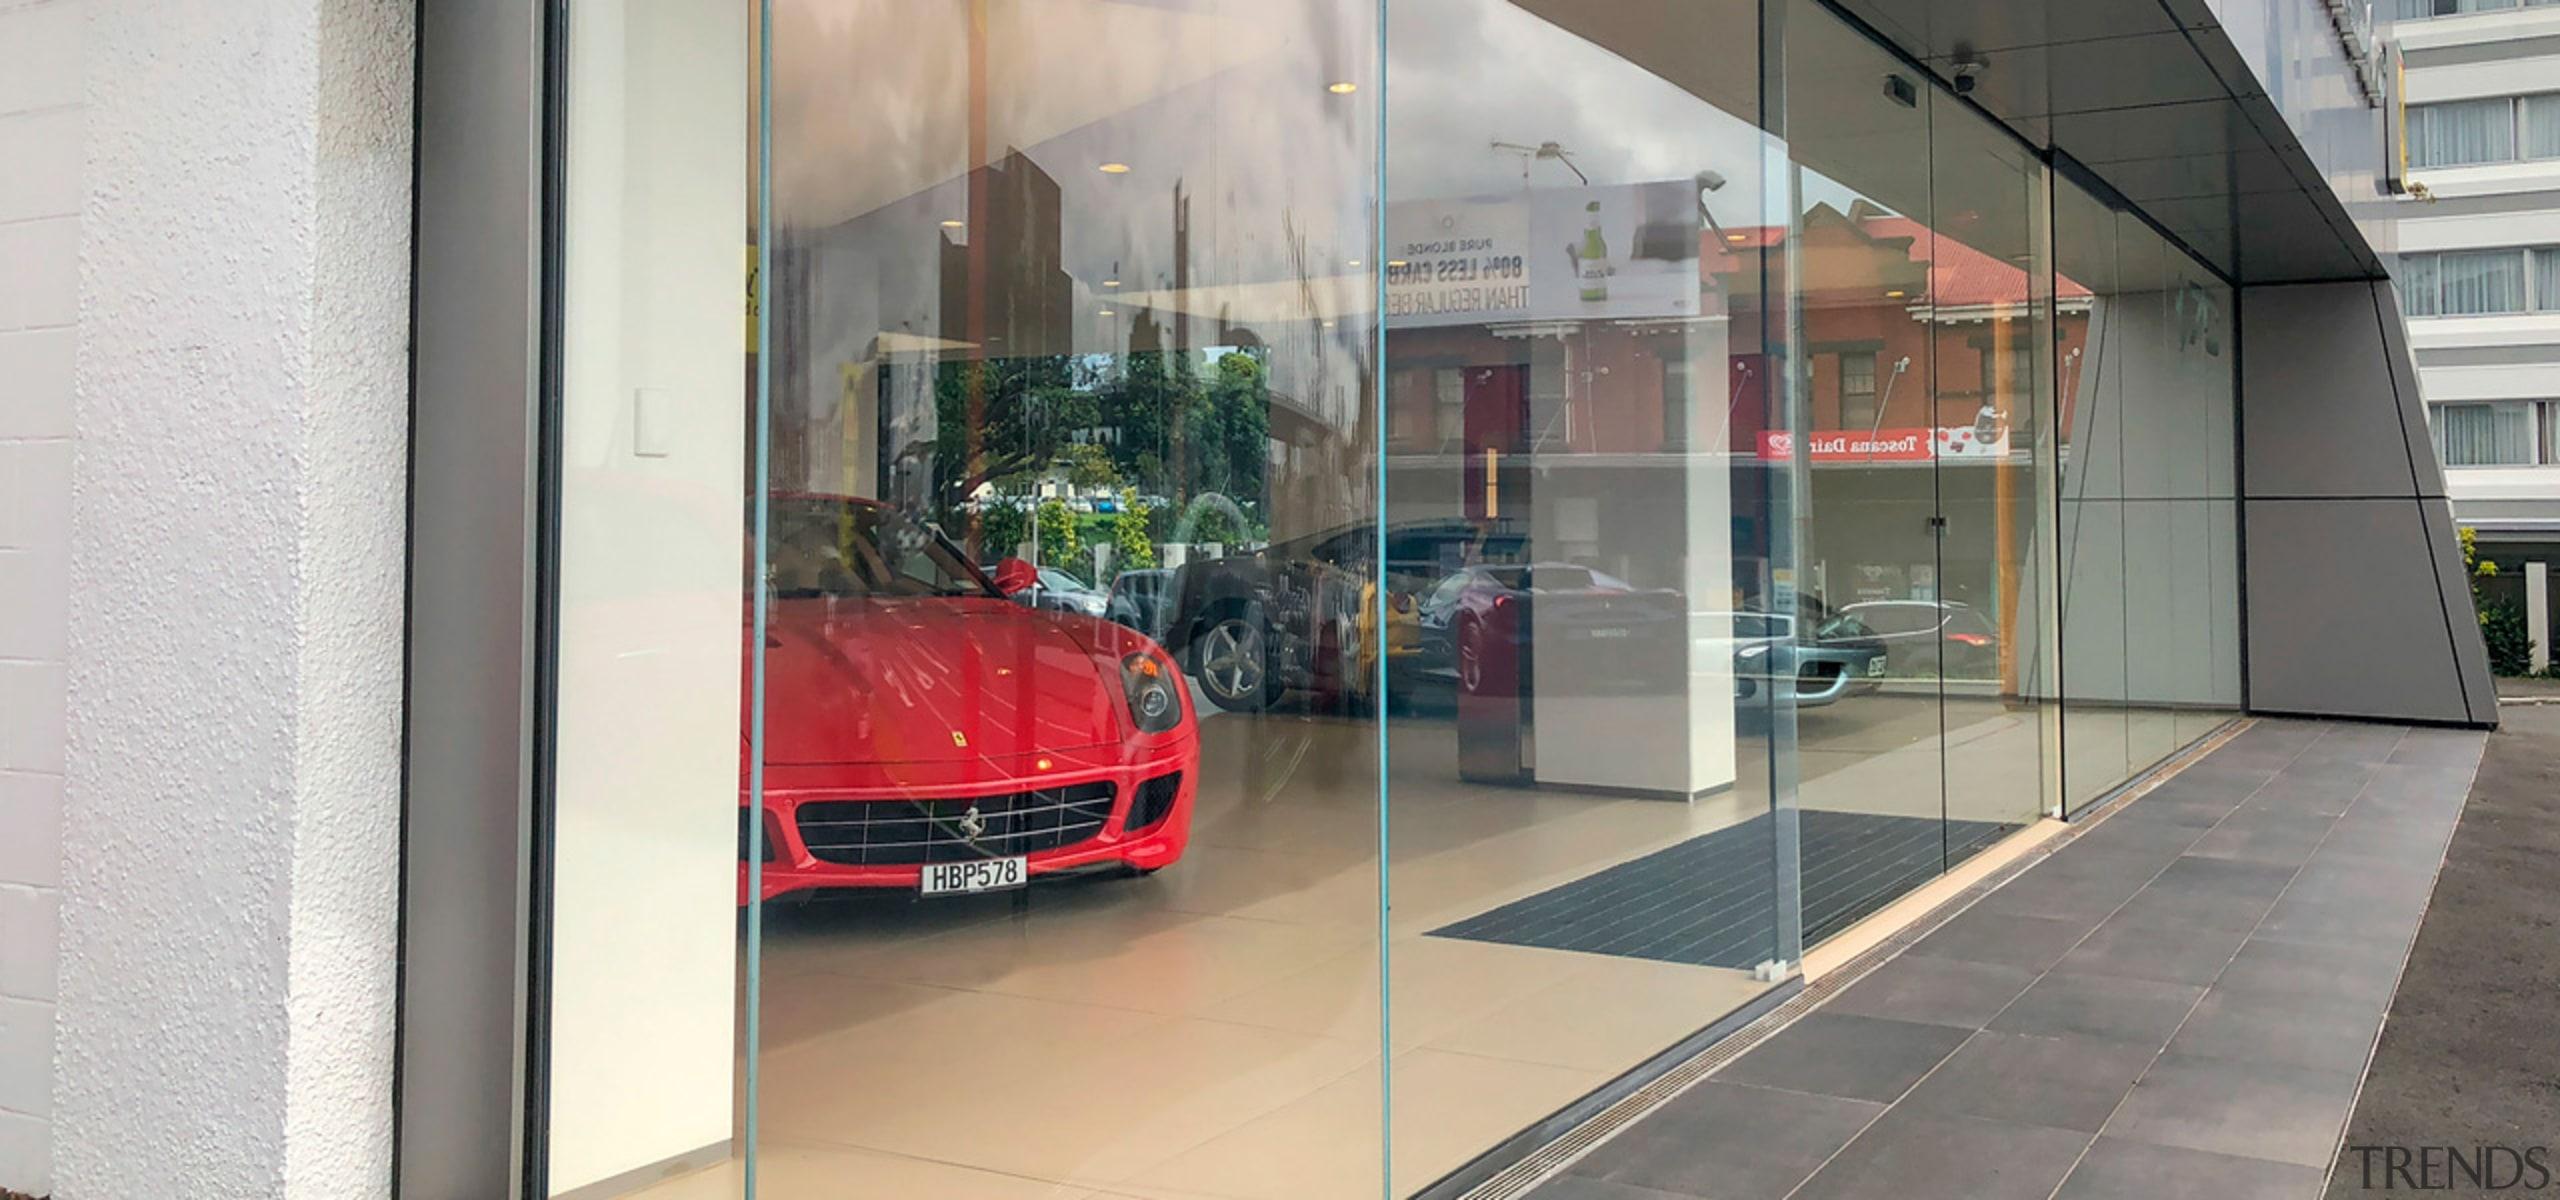 Ferrari Showroom 6 - automotive design | automotive automotive design, automotive exterior, building, car, car dealership, executive car, glass, luxury vehicle, real estate, supercar, vehicle, gray